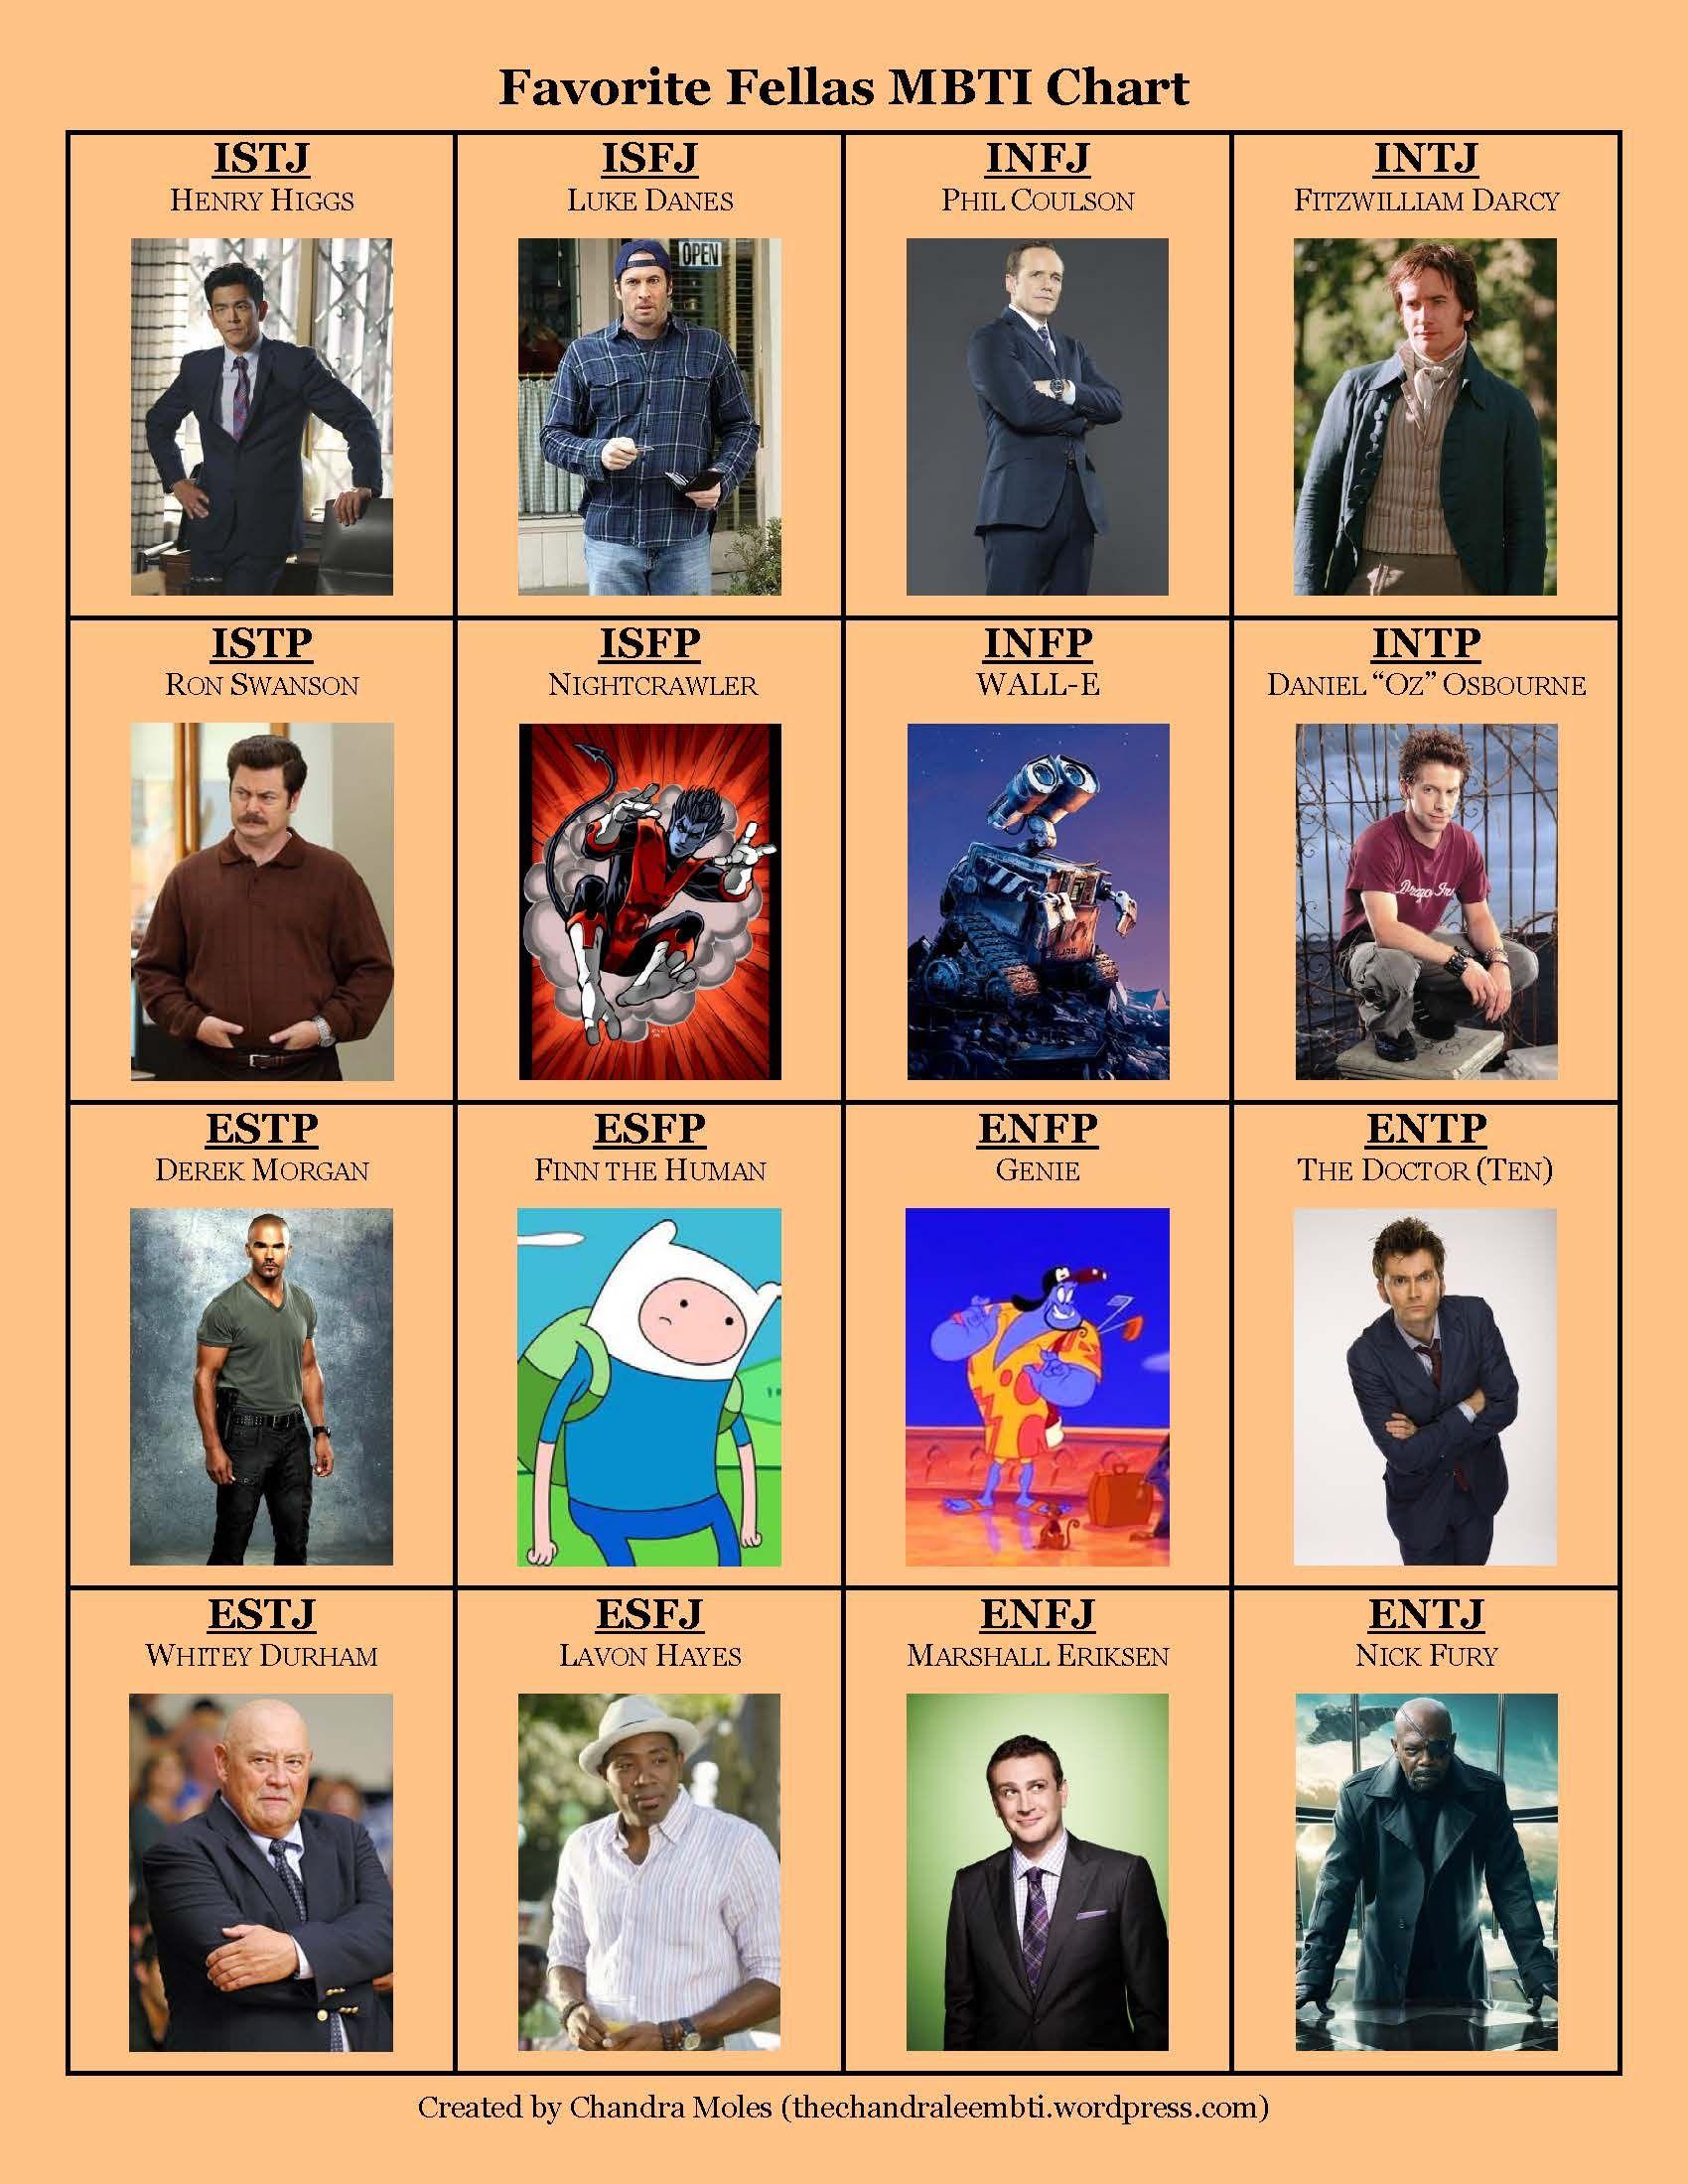 #MyersBriggs #MBTI #FavoriteFellas #AwesomeMBTI #Whovian #Whedonist #Janeite